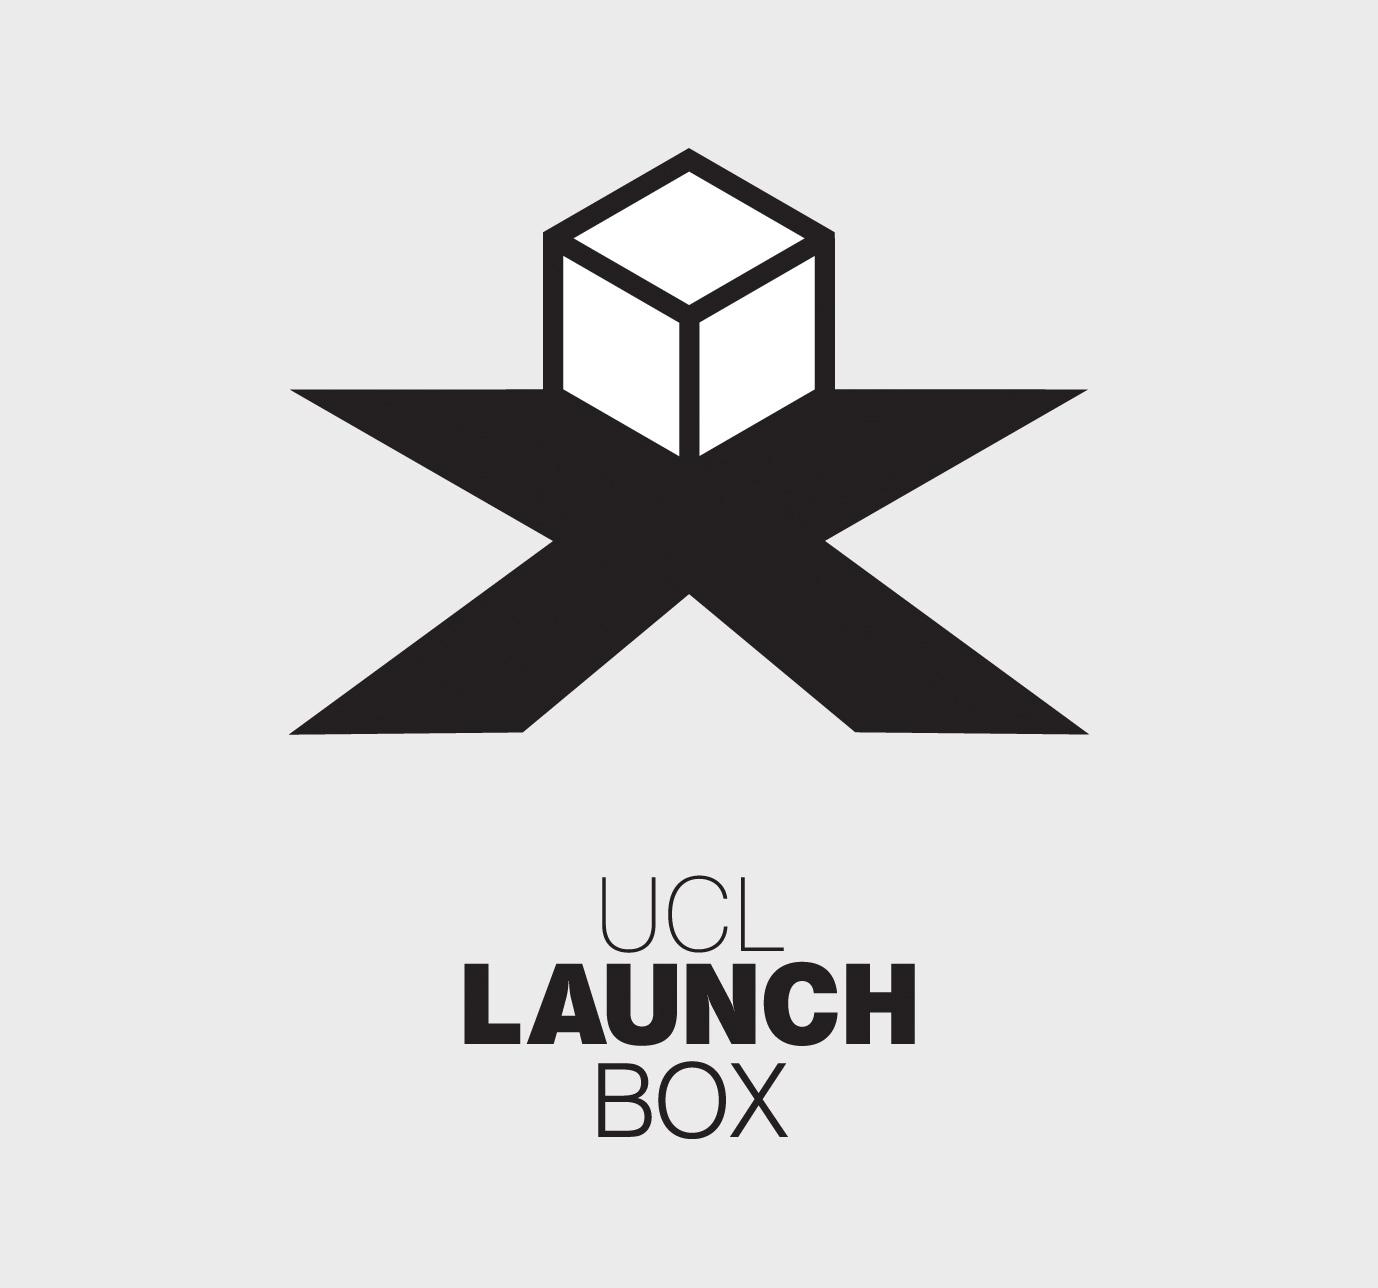 UCL launchbox logo brand design london.jpg